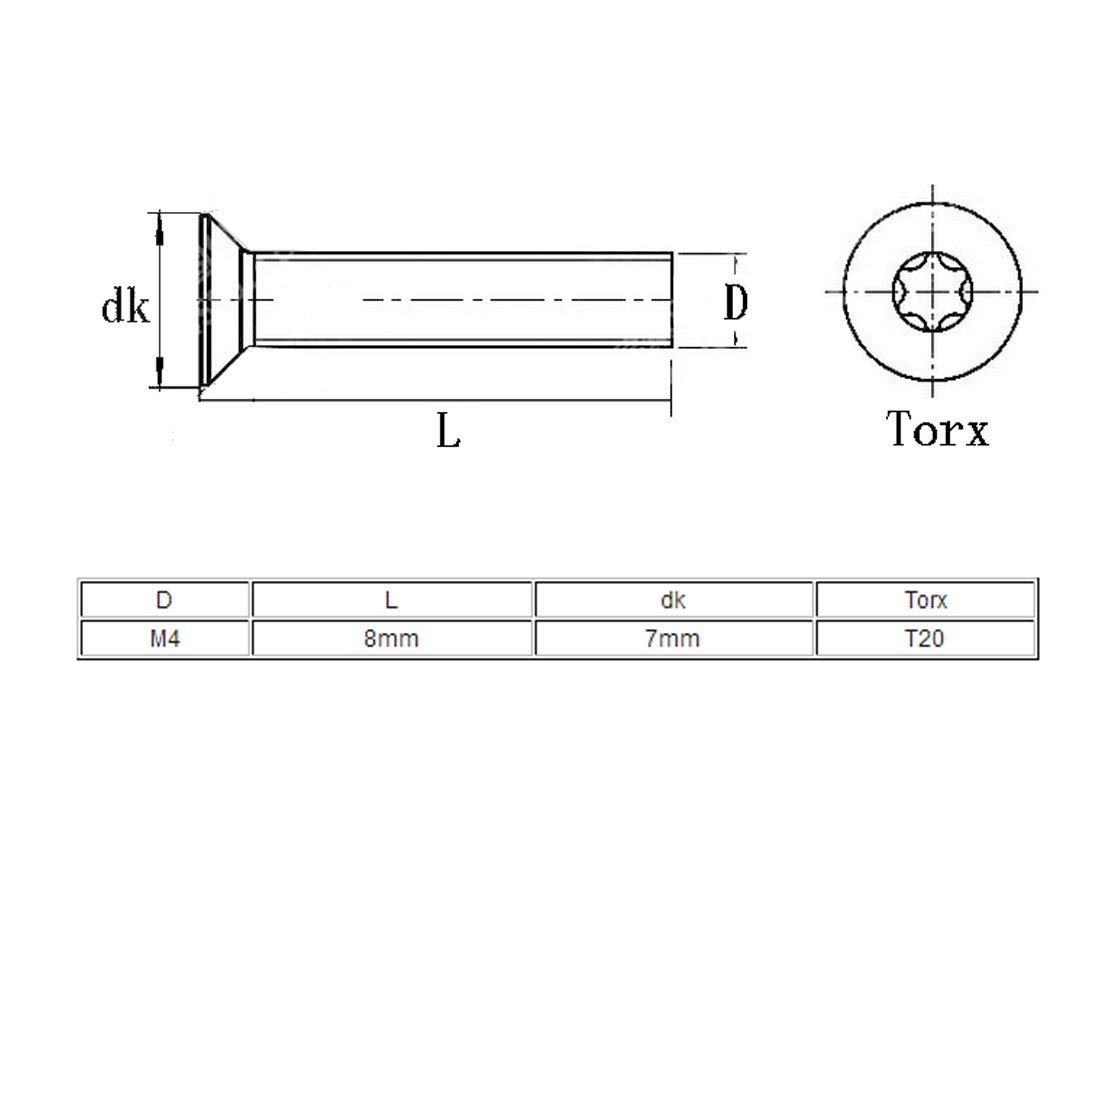 Tornillo tipo torx cabeza plana avellanado M4x8mm acero inoxidable 304 80 piezas